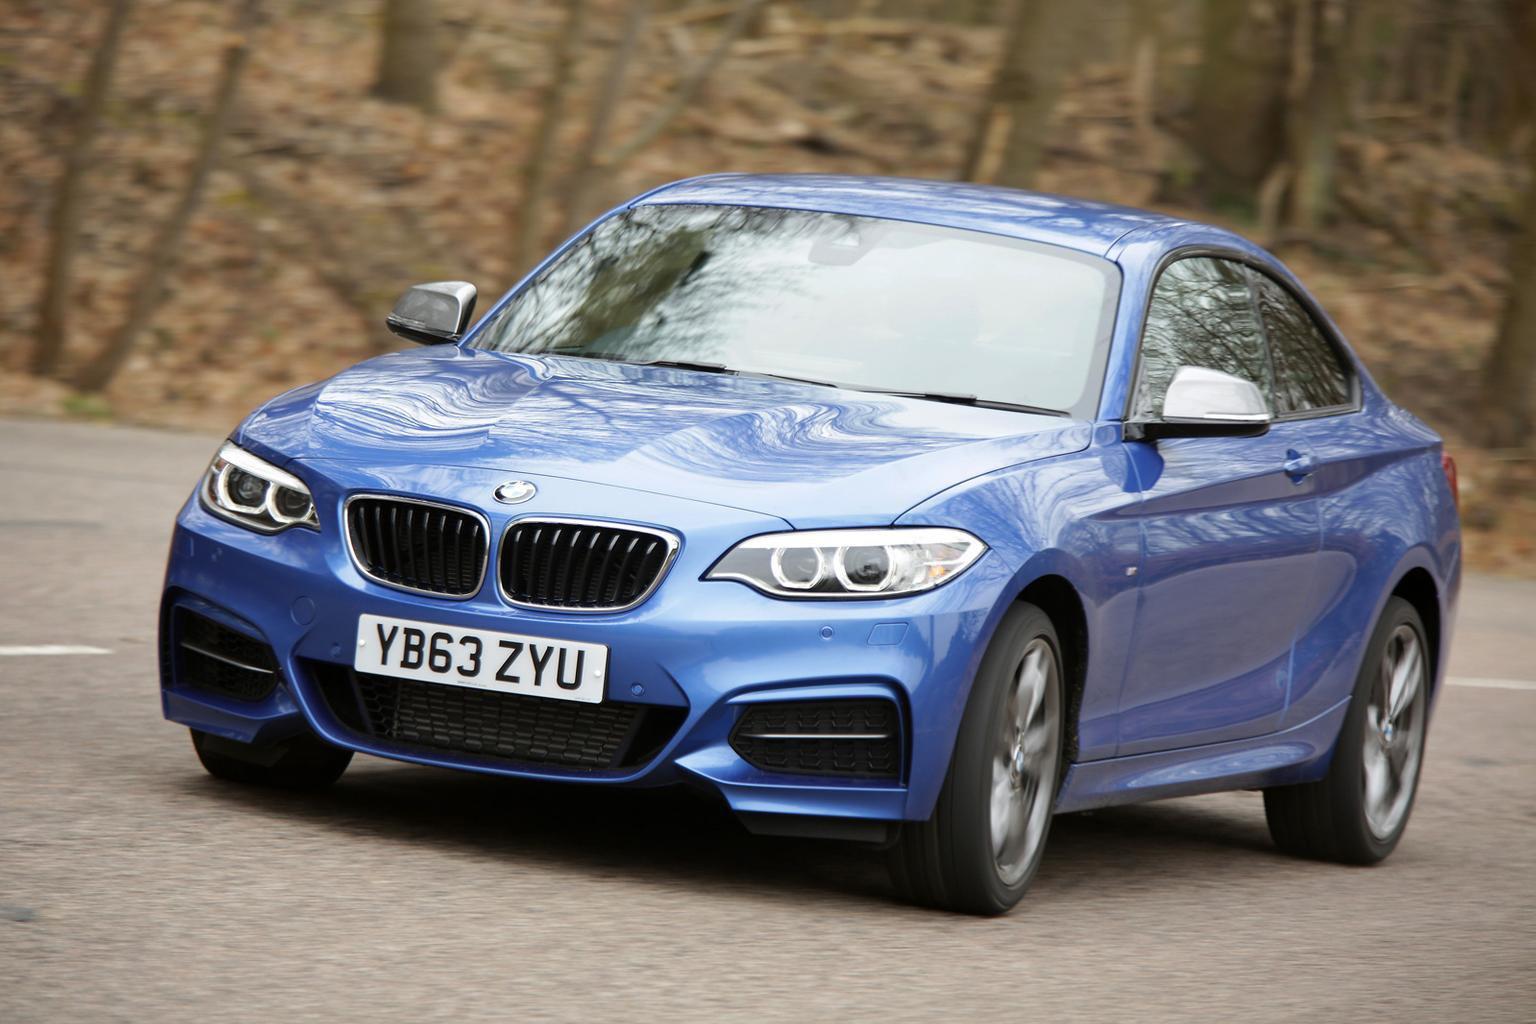 2014 BMW M235i review